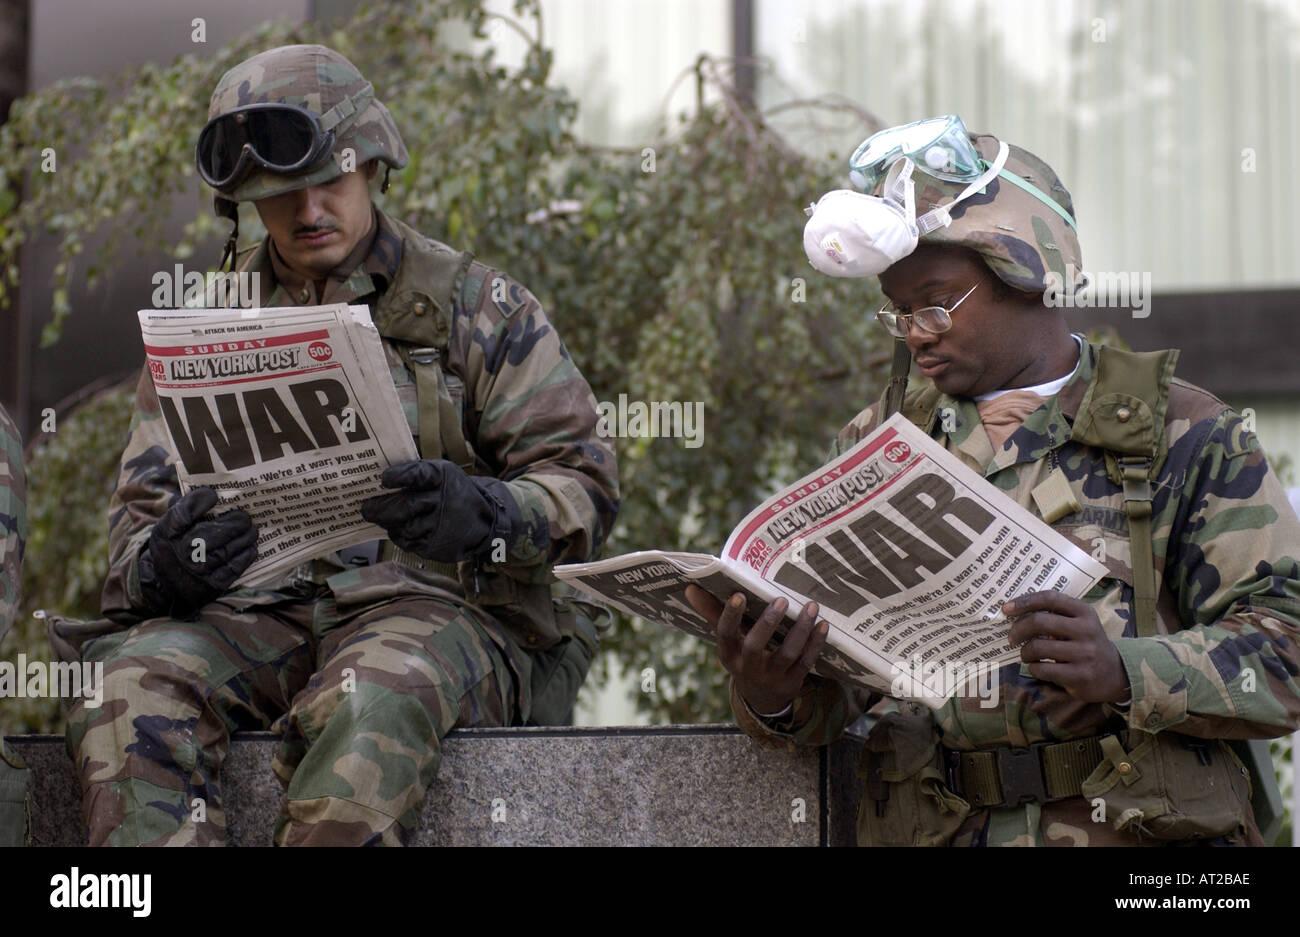 US Soldiers reading newspaper headline of WAR three days after 9 11  terrorist attacks in New York City at ground zero - Stock Image